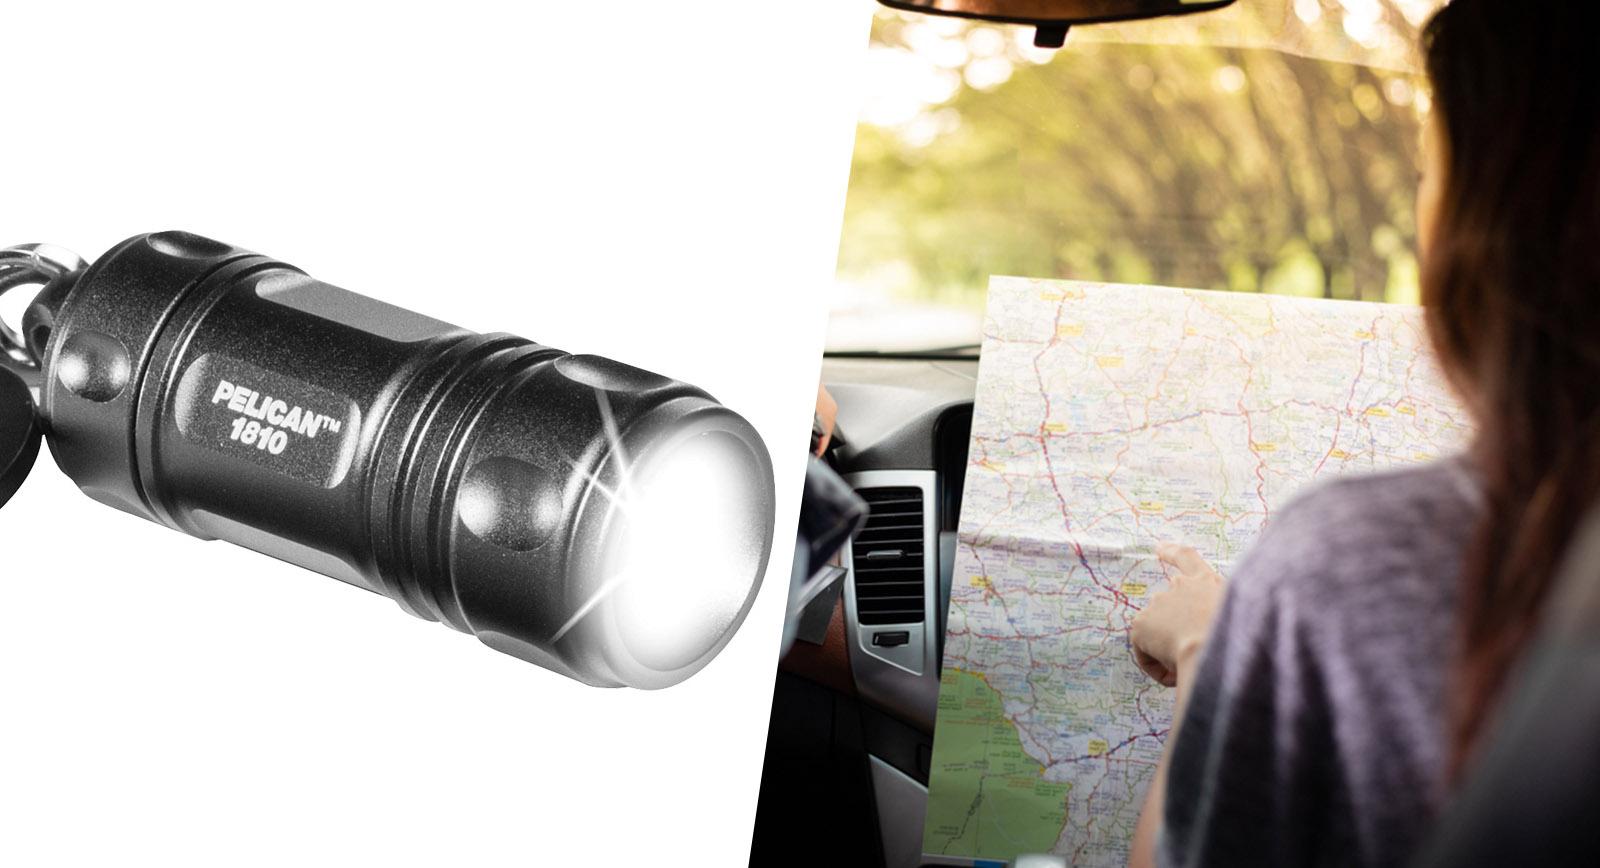 trip flashlight and map